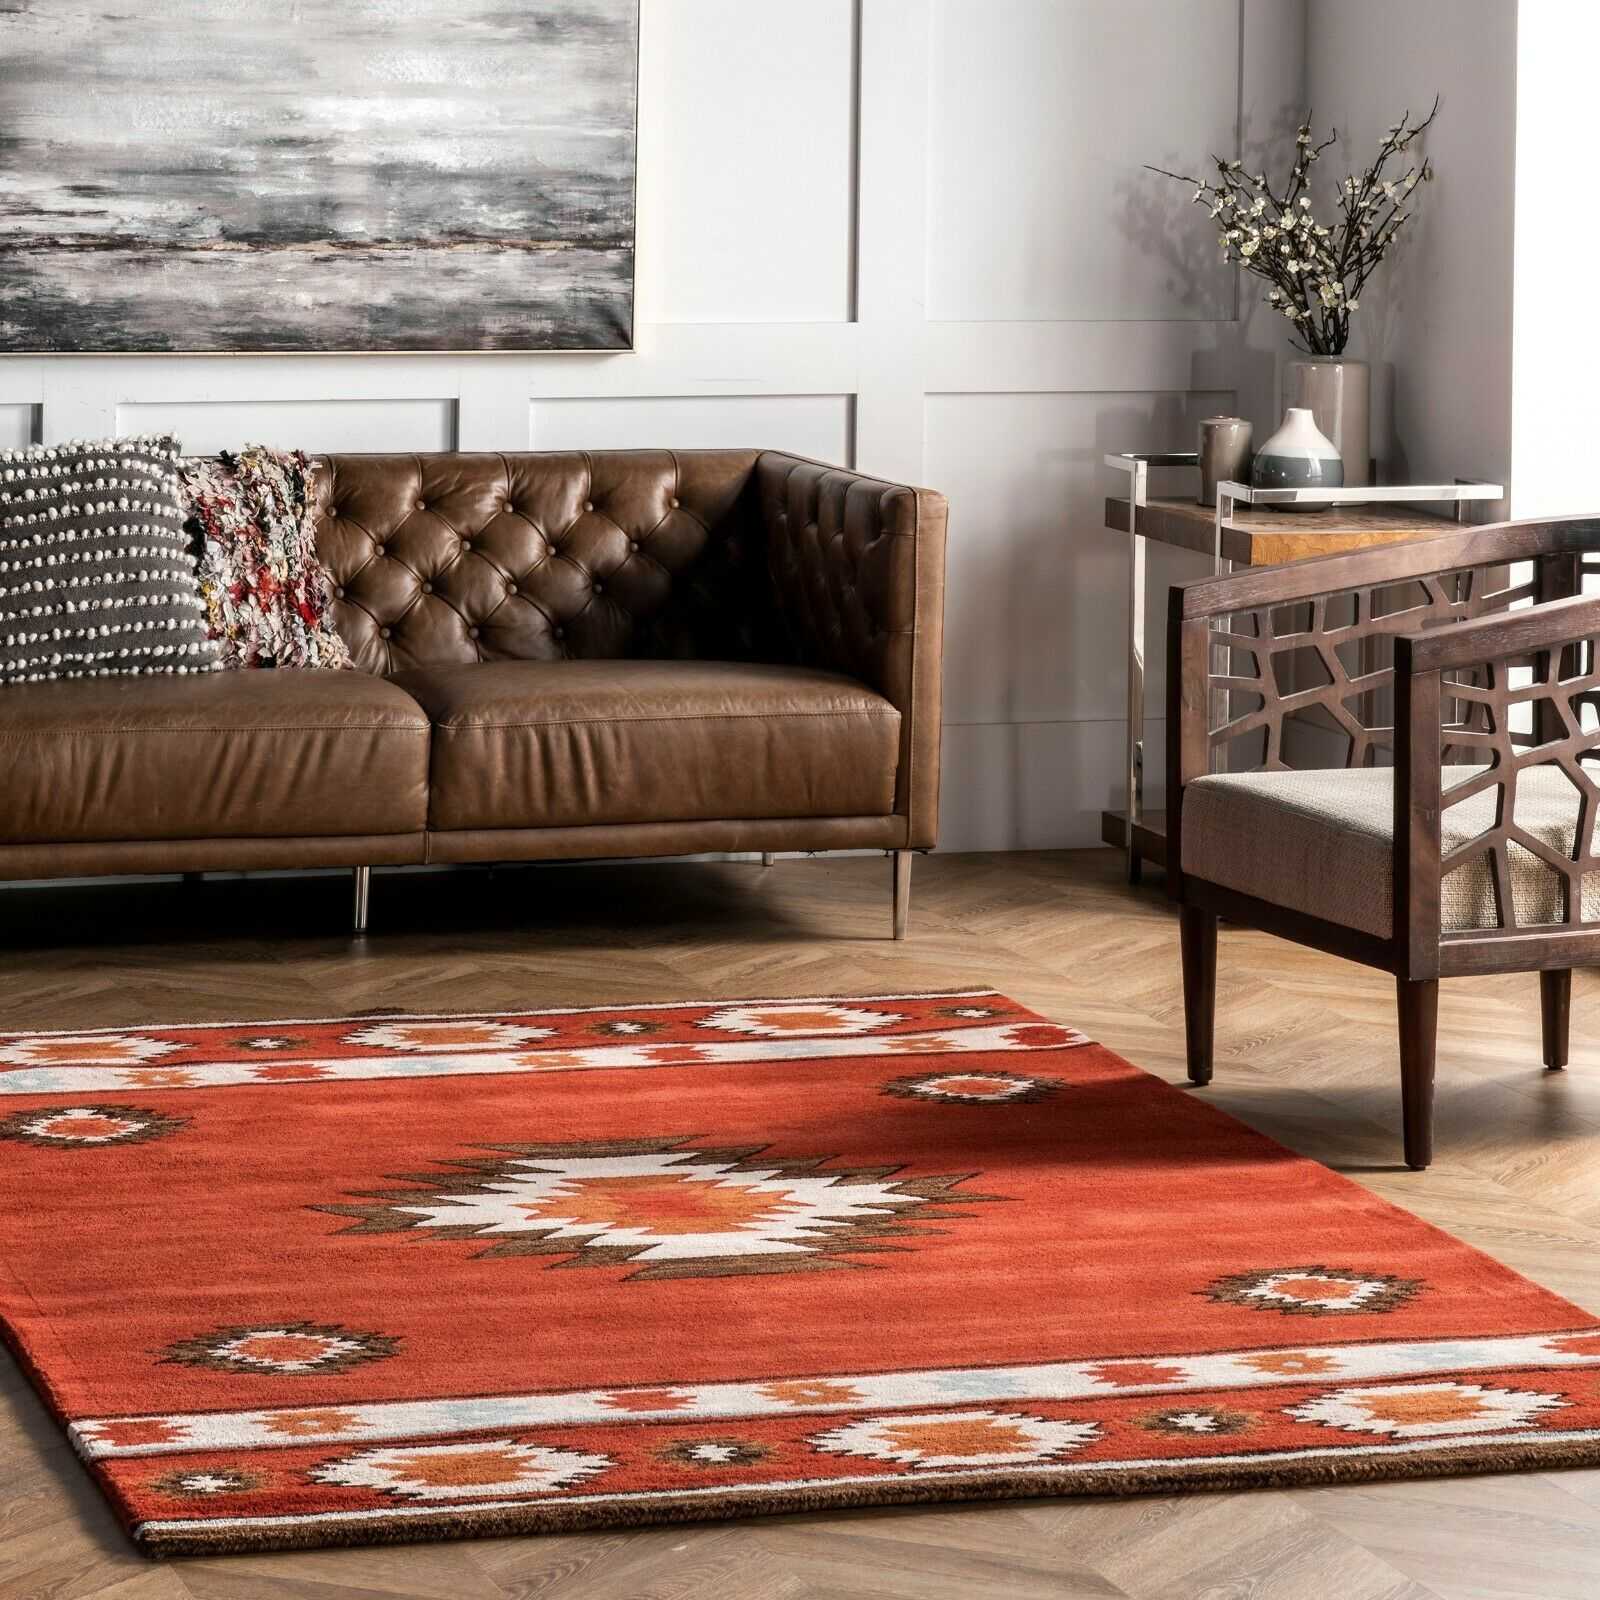 Picture of: Nuloom Handmade Southwestern Geometric Wool Area Rug In Burnt Orange Wine Color For Sale Online